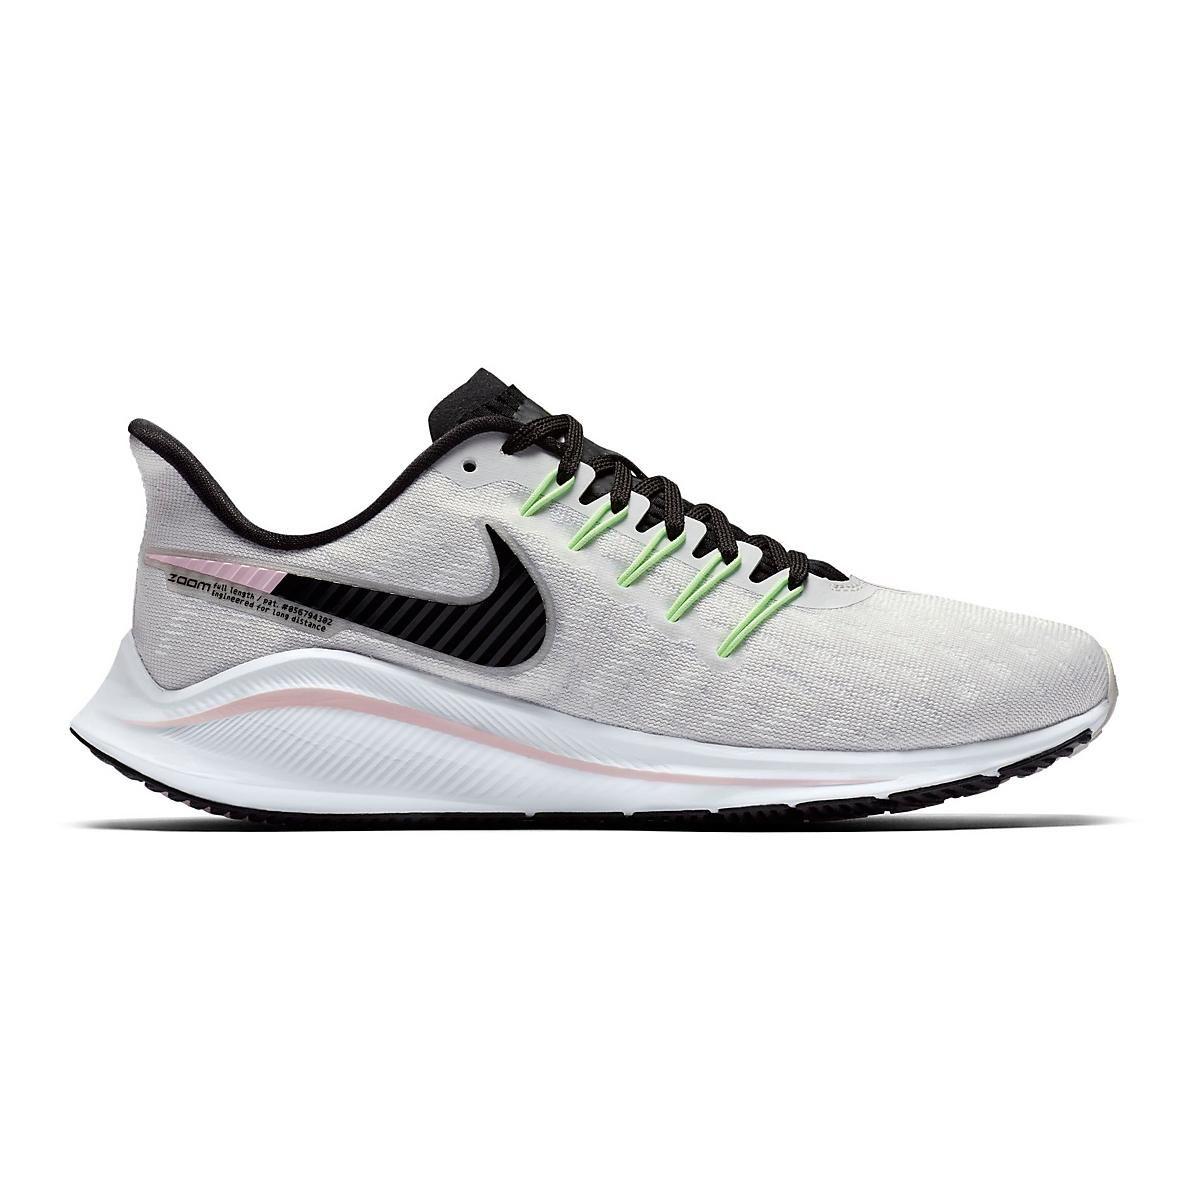 Women S Nike Air Zoom Vomero 14 Running Shoes Running Shoes Grey Top Running Shoes Nike Air Zoom